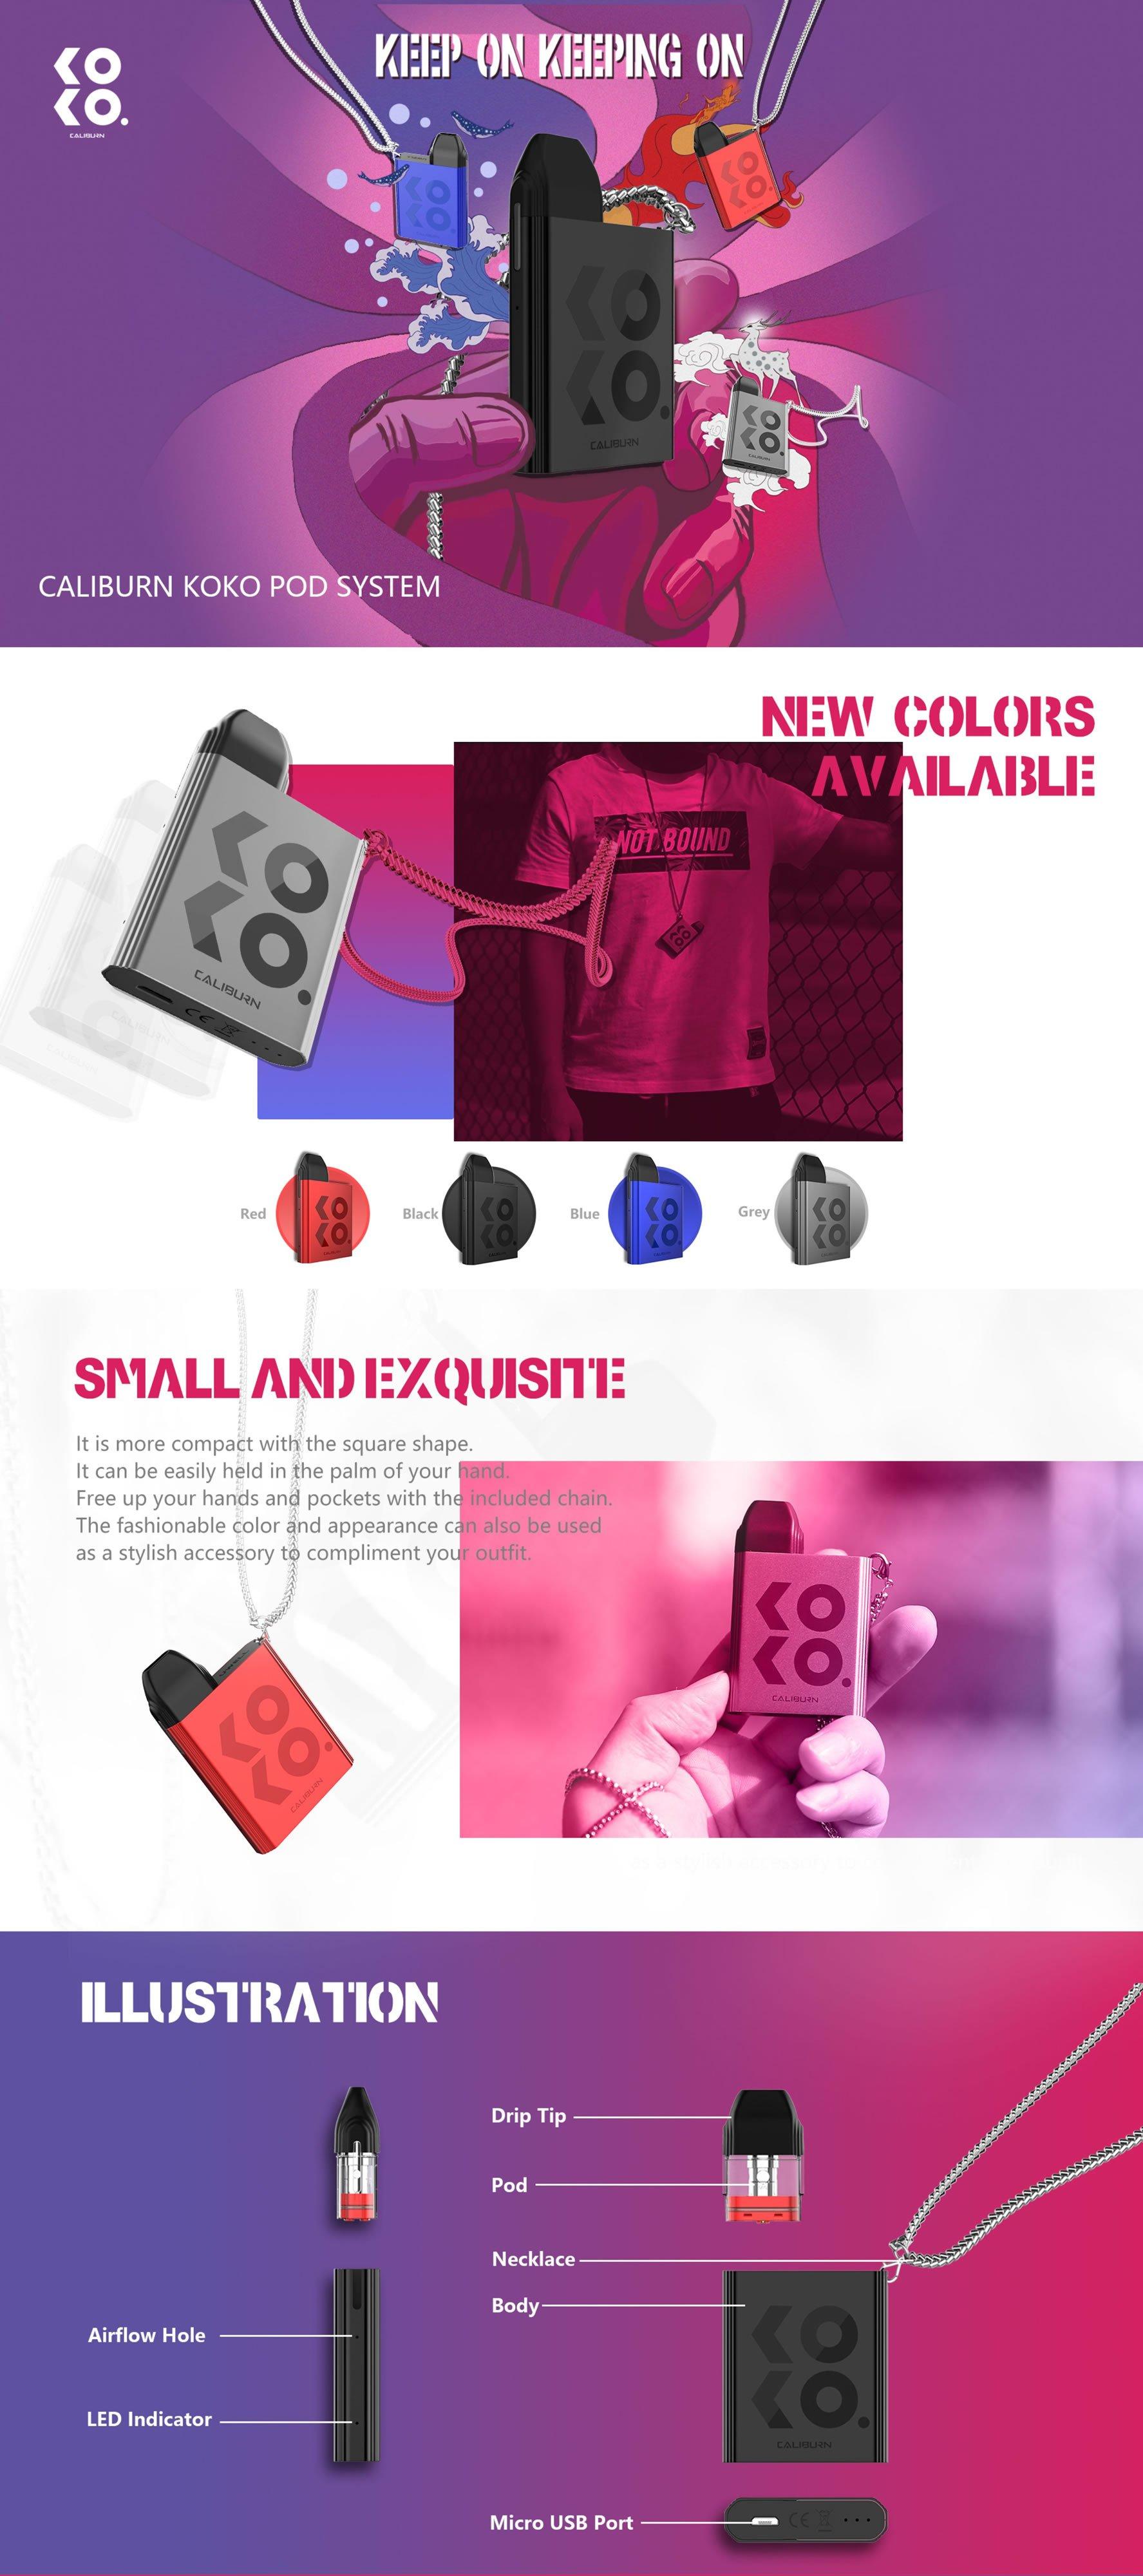 A infographic of the new Caliburn KOKO Pod Vape Kit